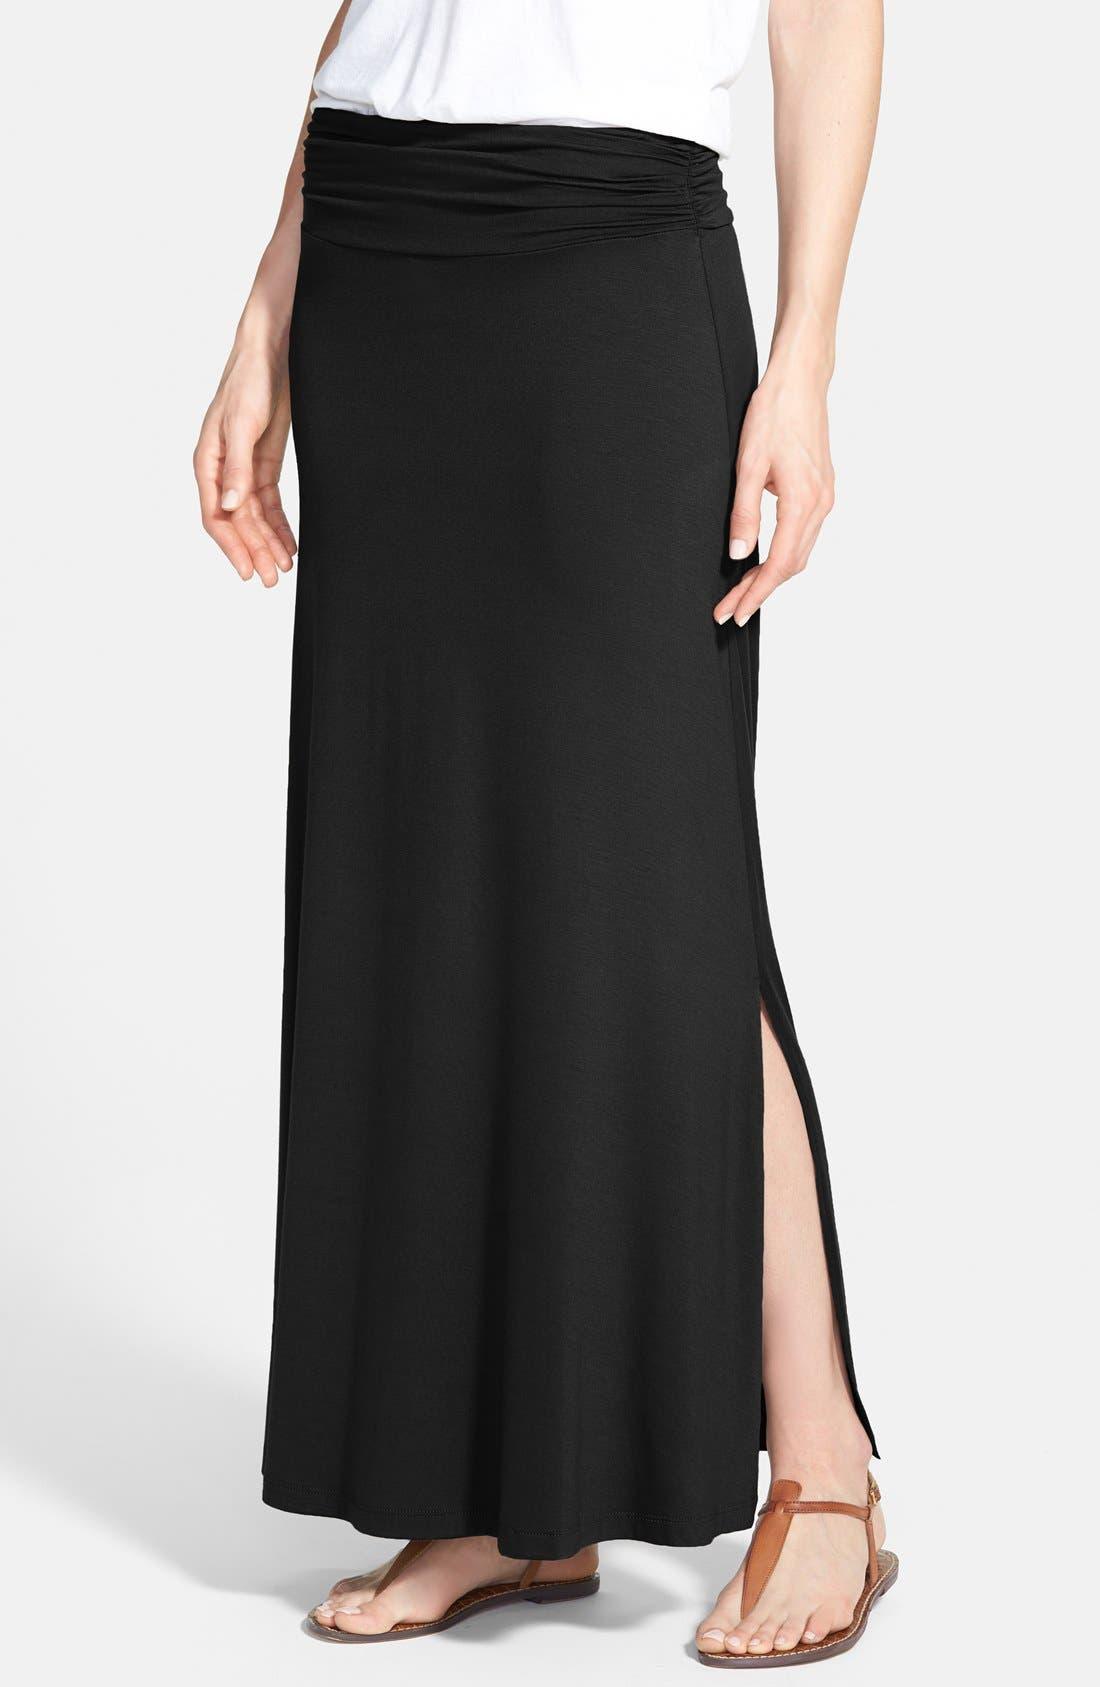 Alternate Image 1 Selected - Bobeau Ruched Waist Side Slit Maxi Skirt (Regular & Petite)